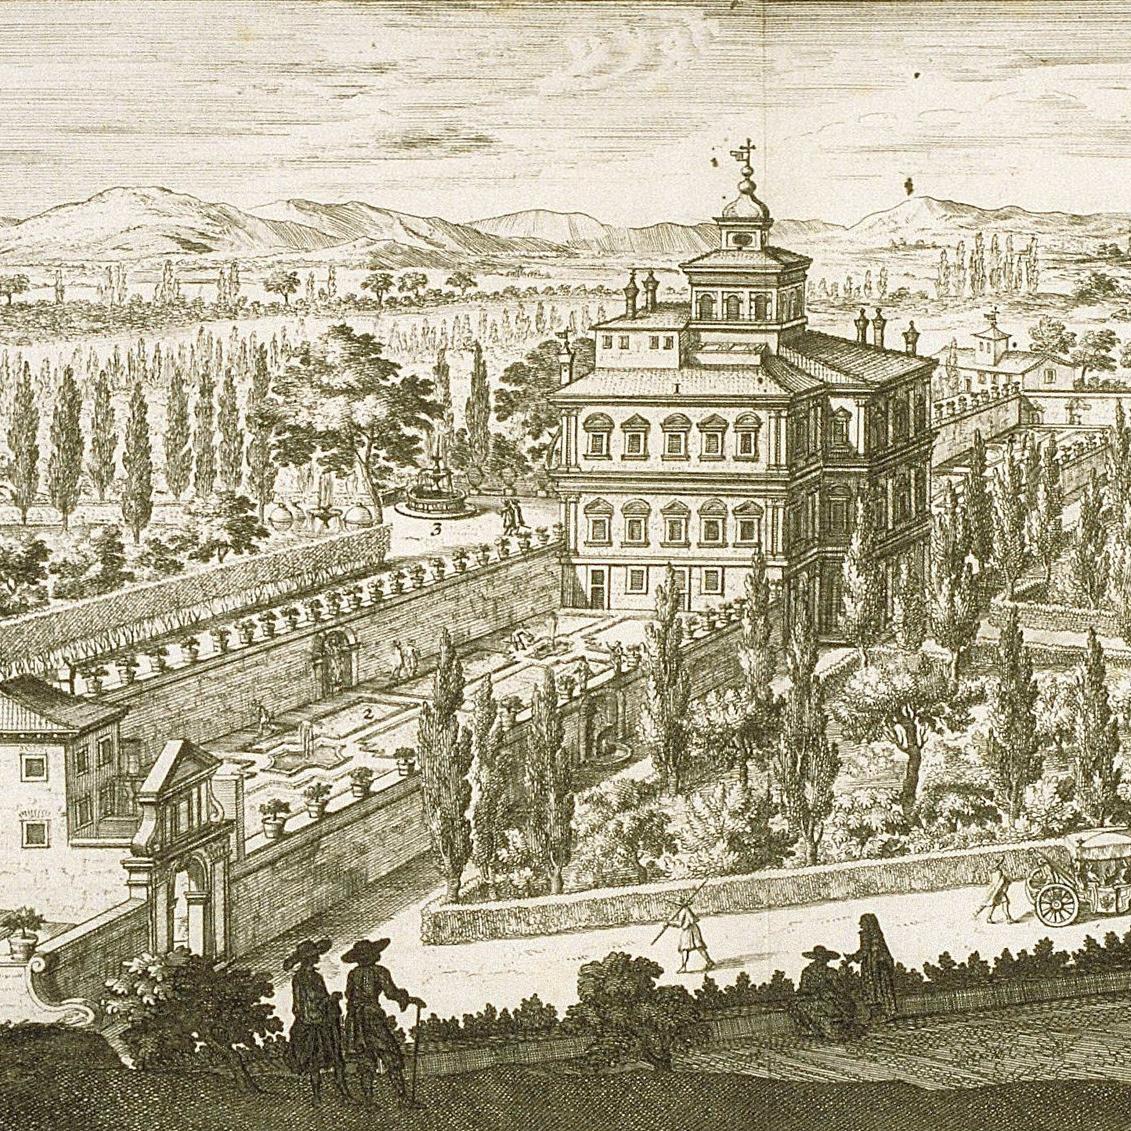 Rom Villa Peretti Montalto Fontana 1588:89.jpg